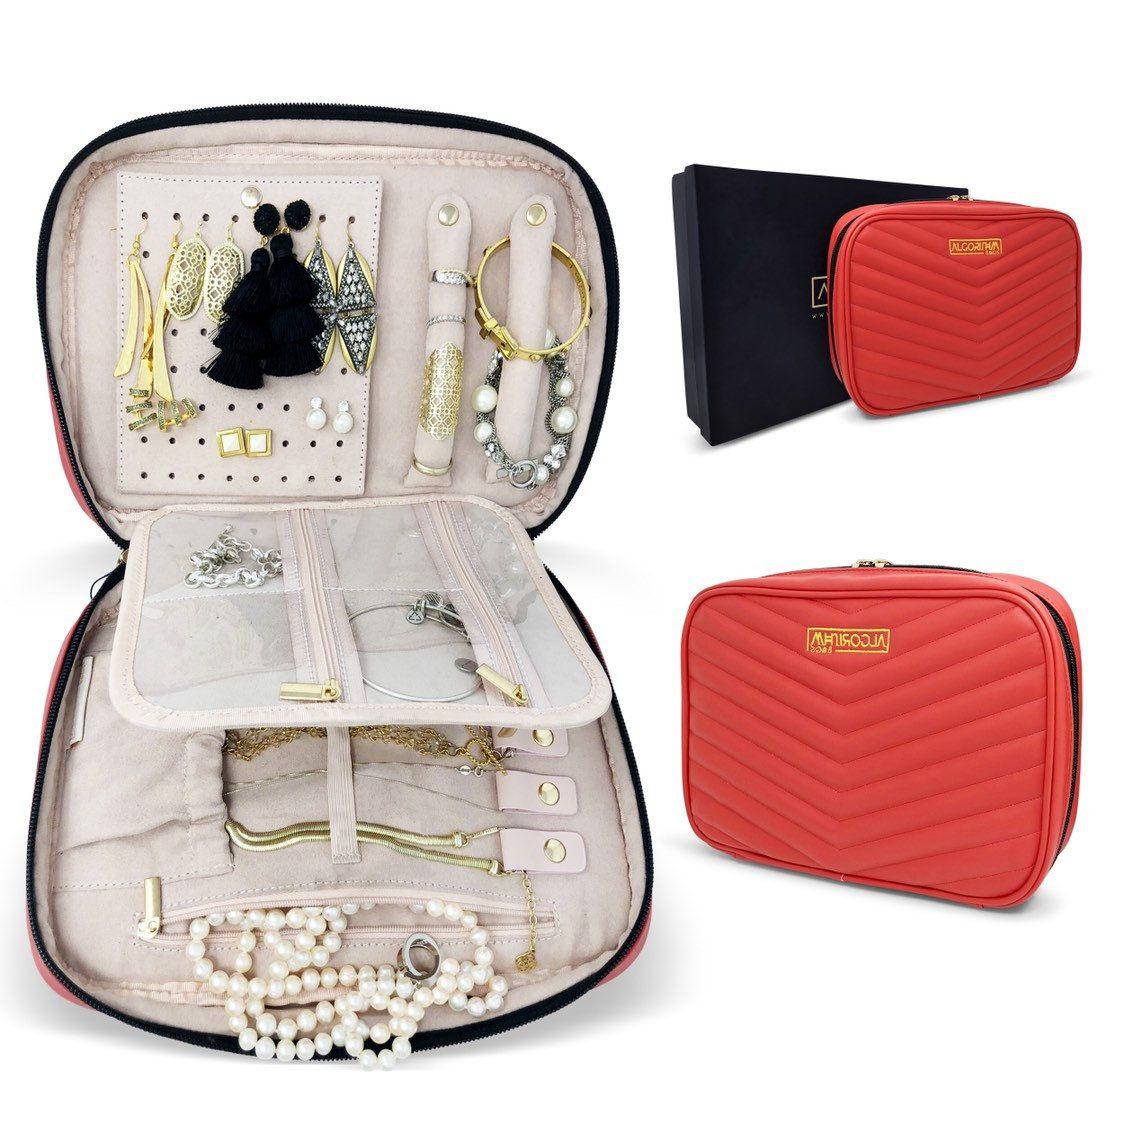 Jewelry organizer travel leather case storage red